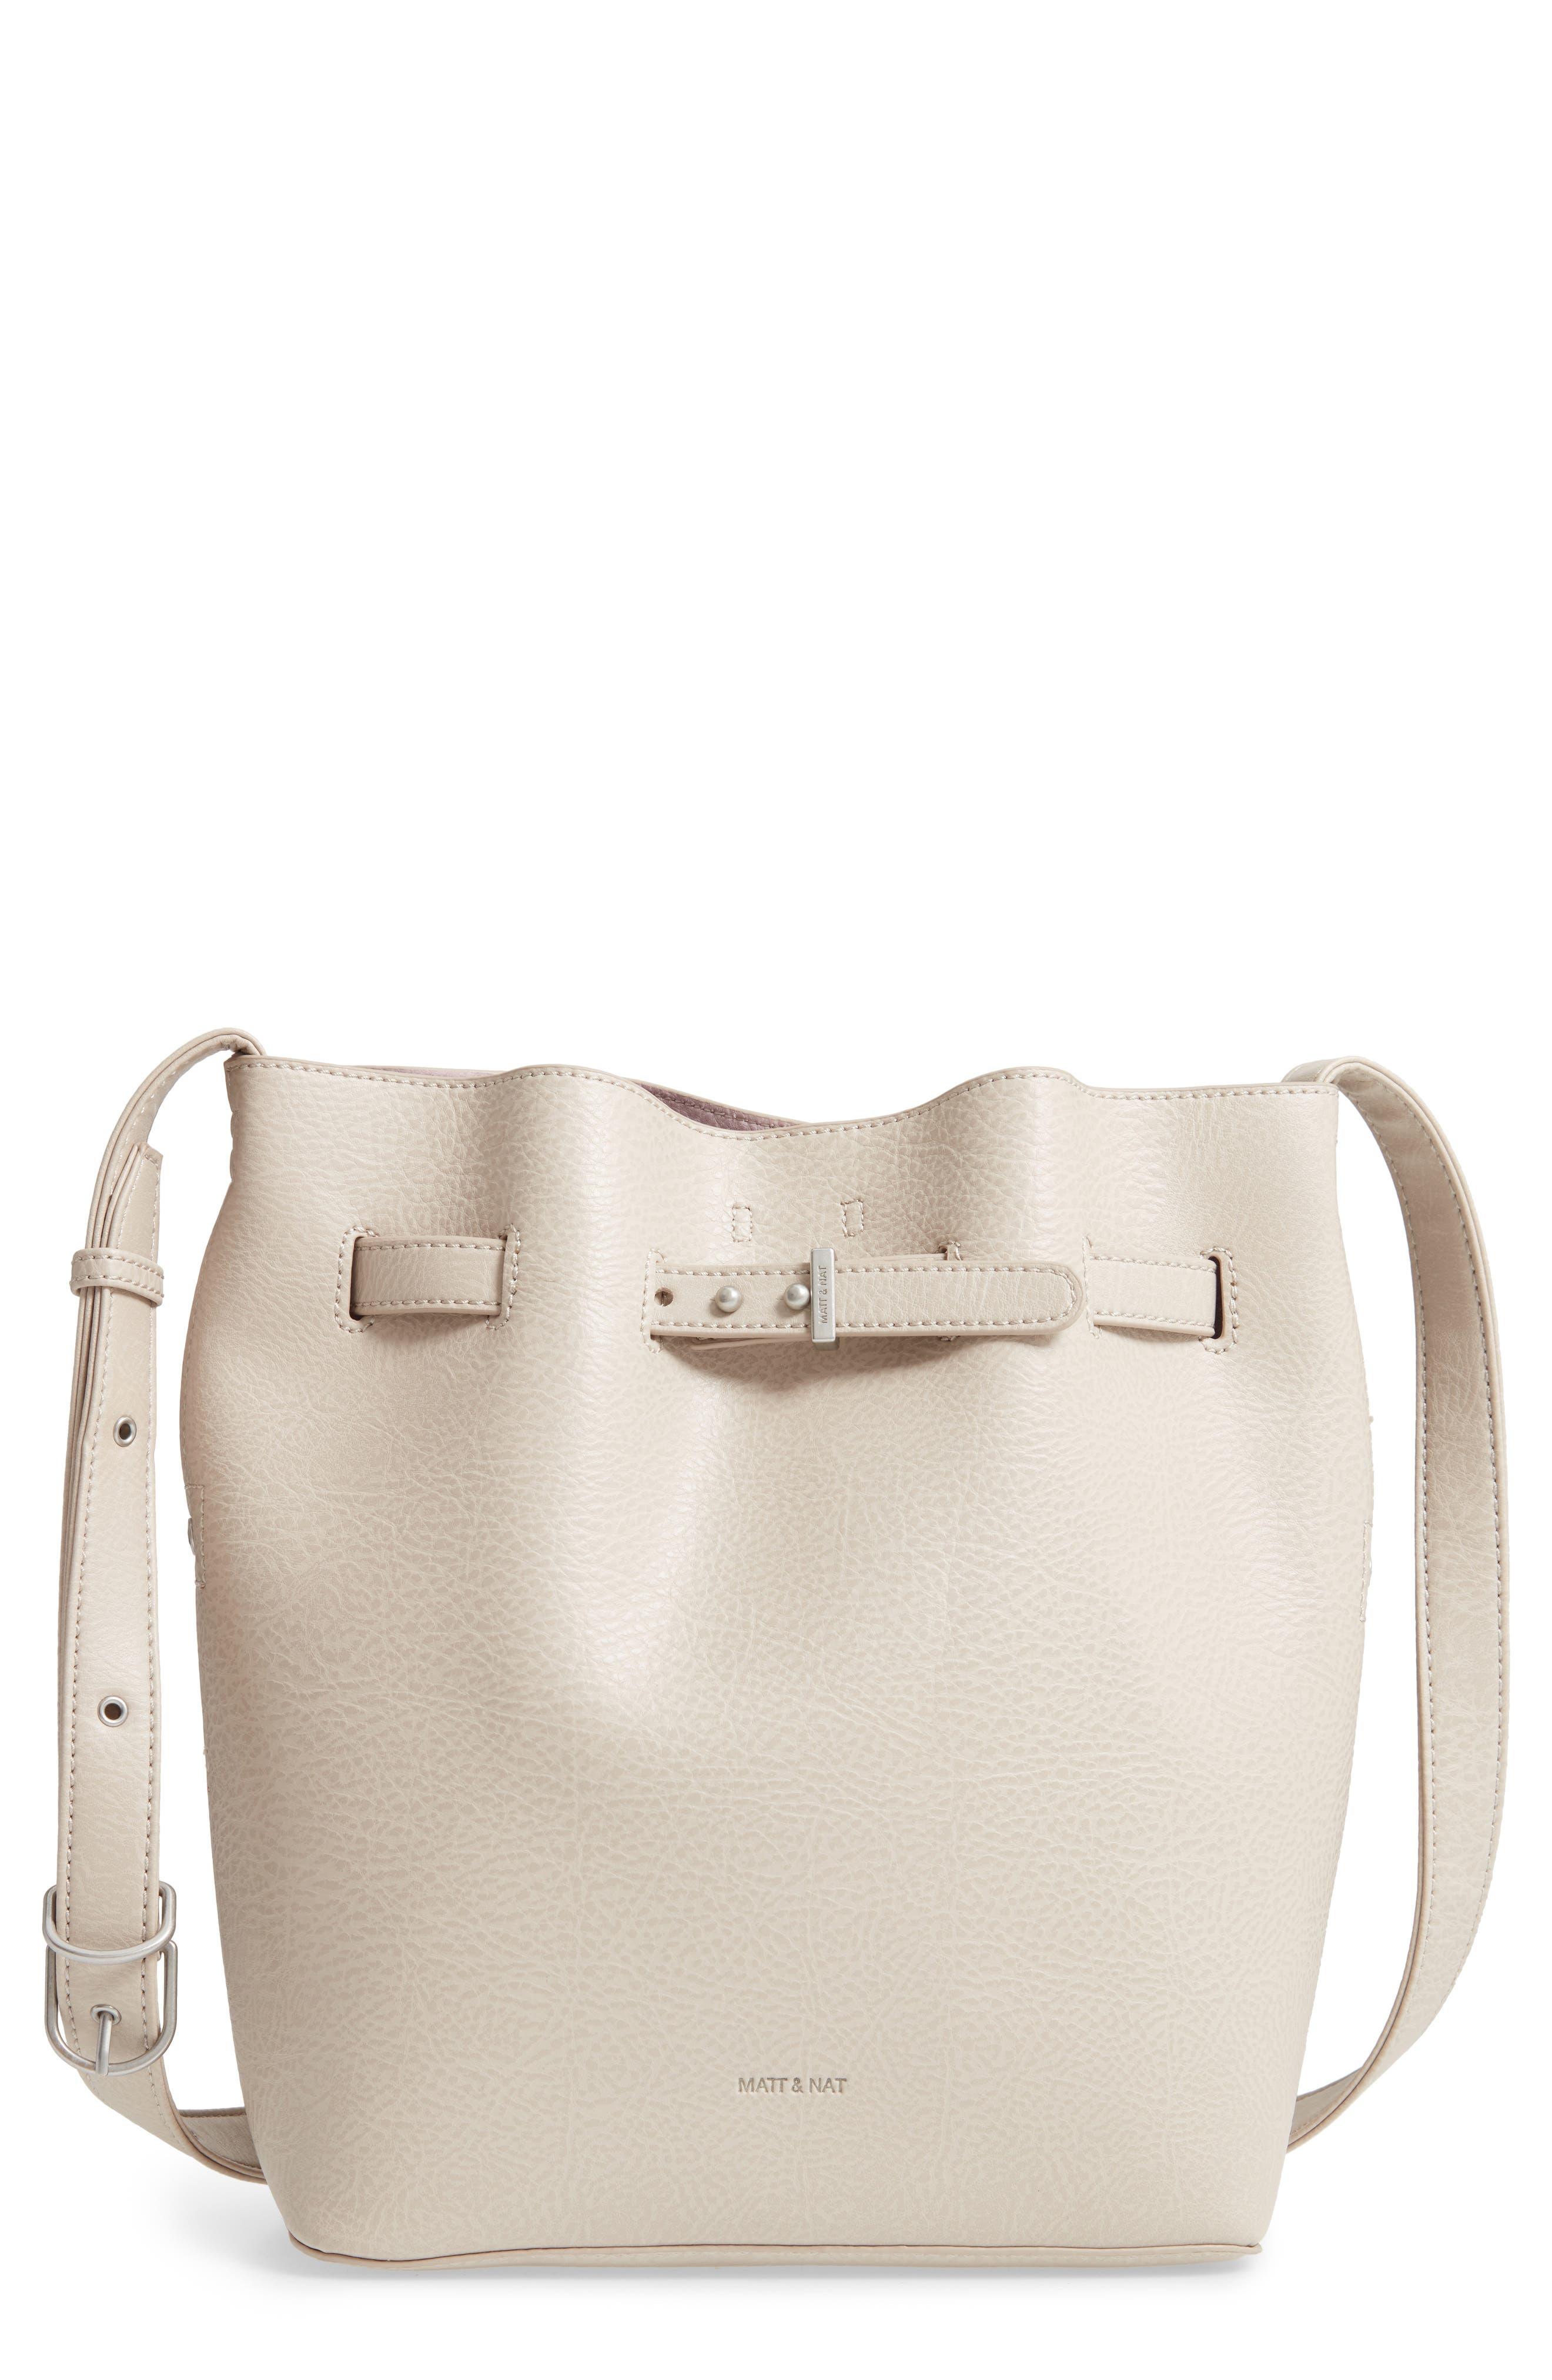 Matt & Nat Lexi Faux Leather Bucket Bag -